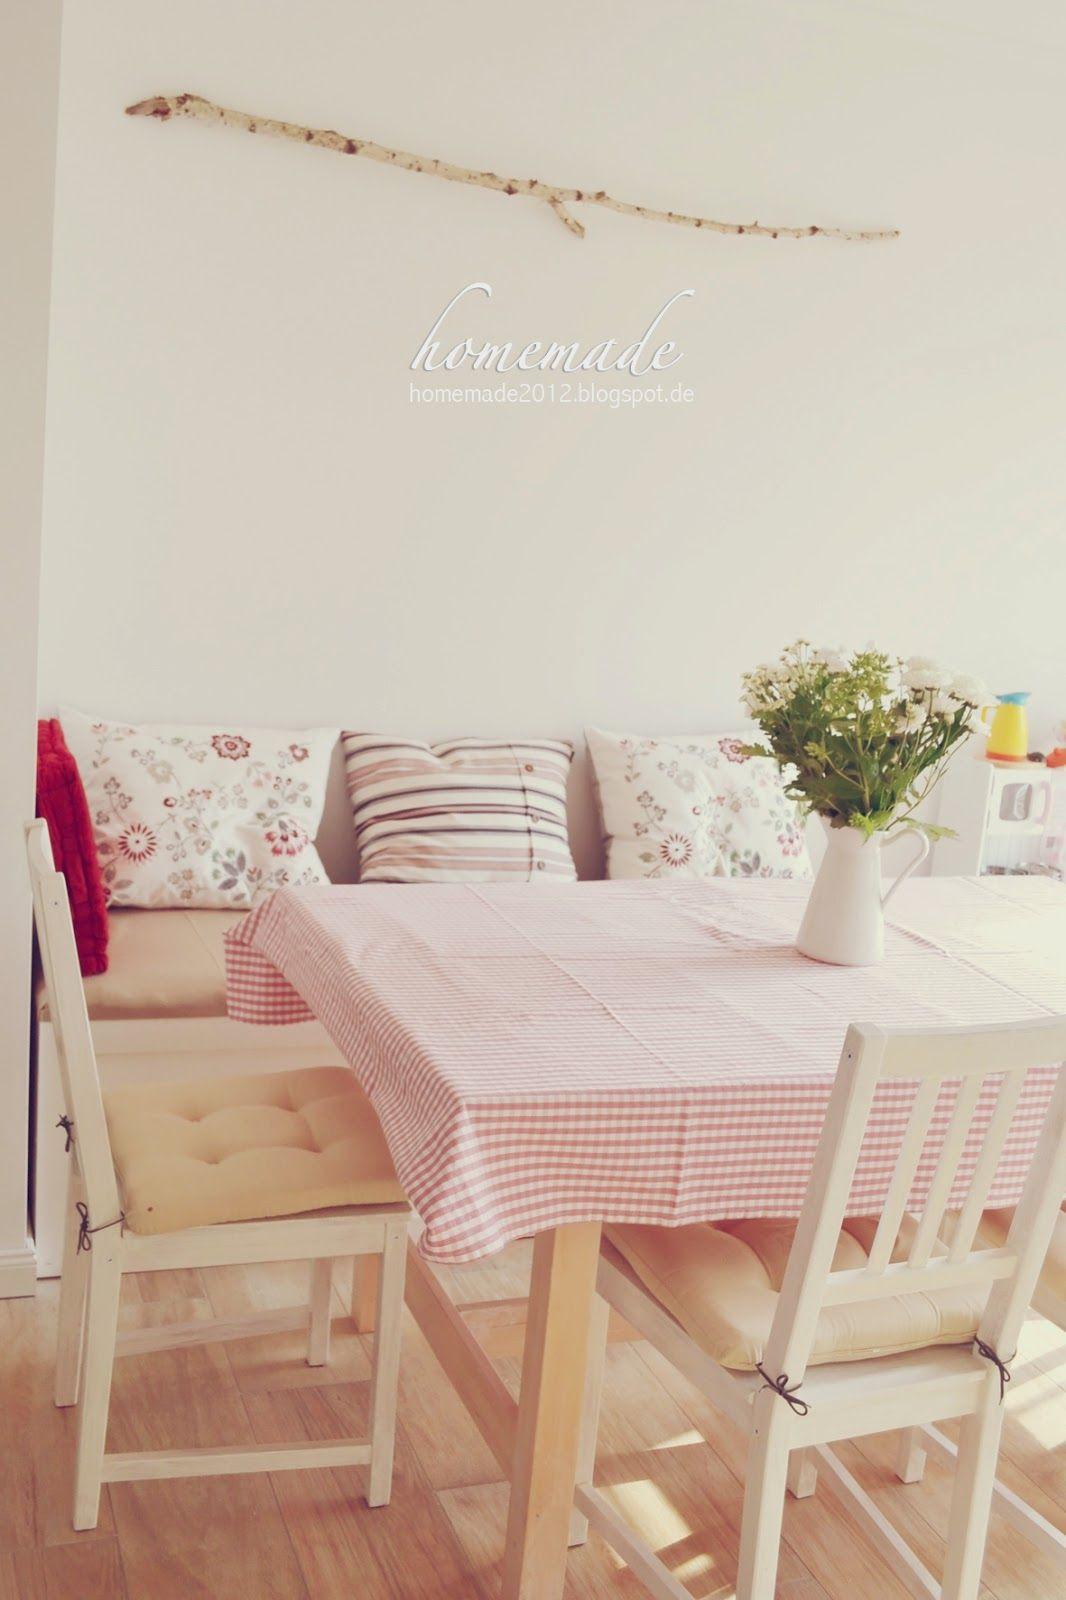 Sitzbank Diy  homemade ♥ Sitzbank DIY Home ideas